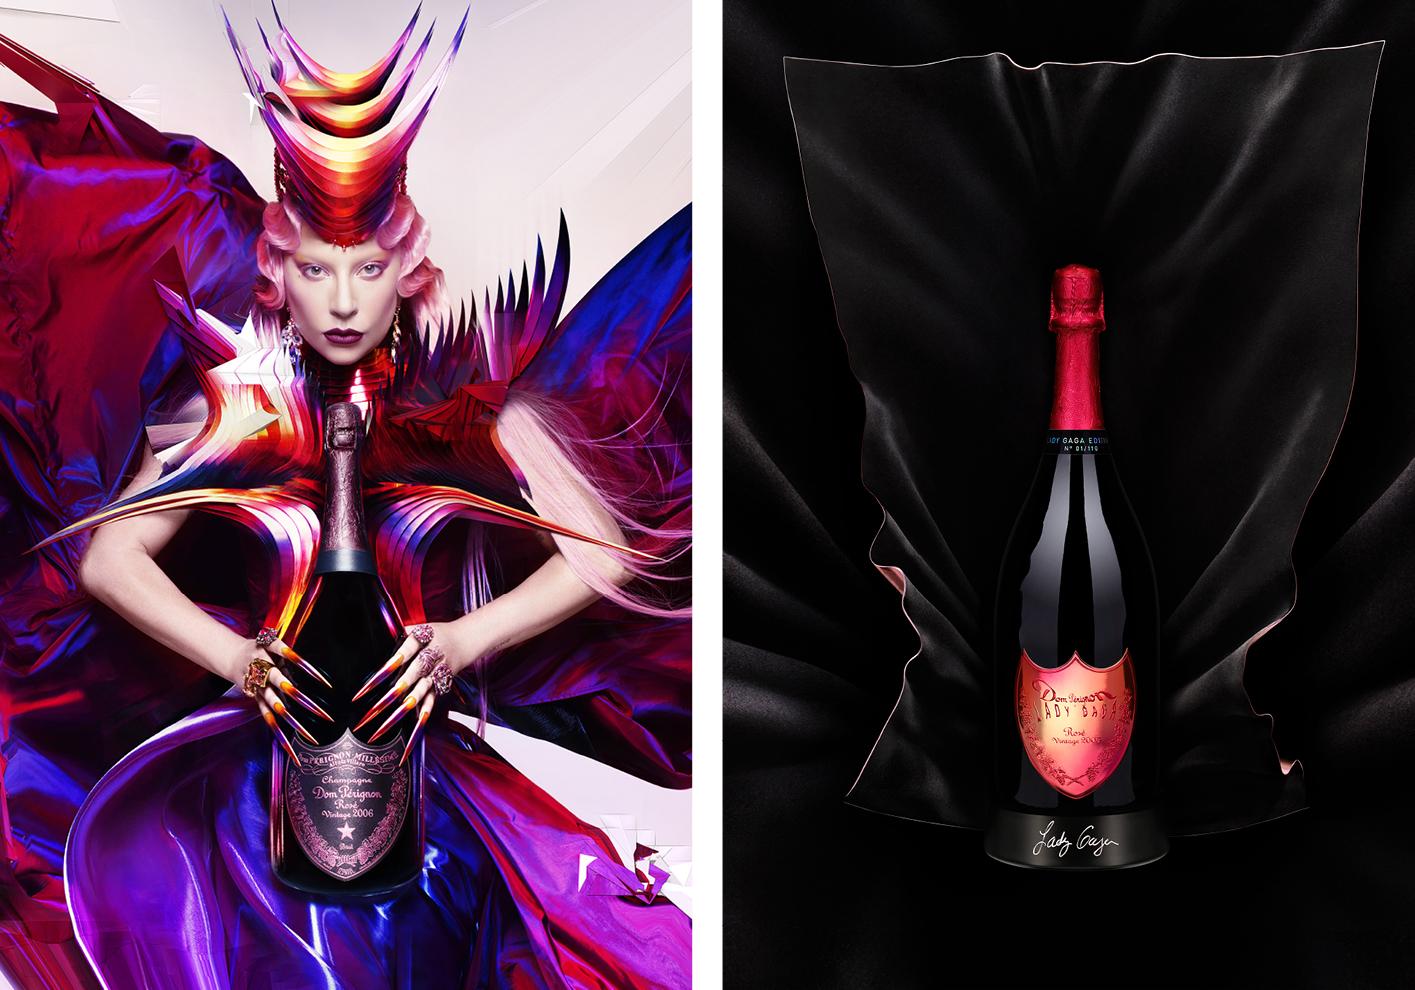 Dom Pérignon and Lady Gaga